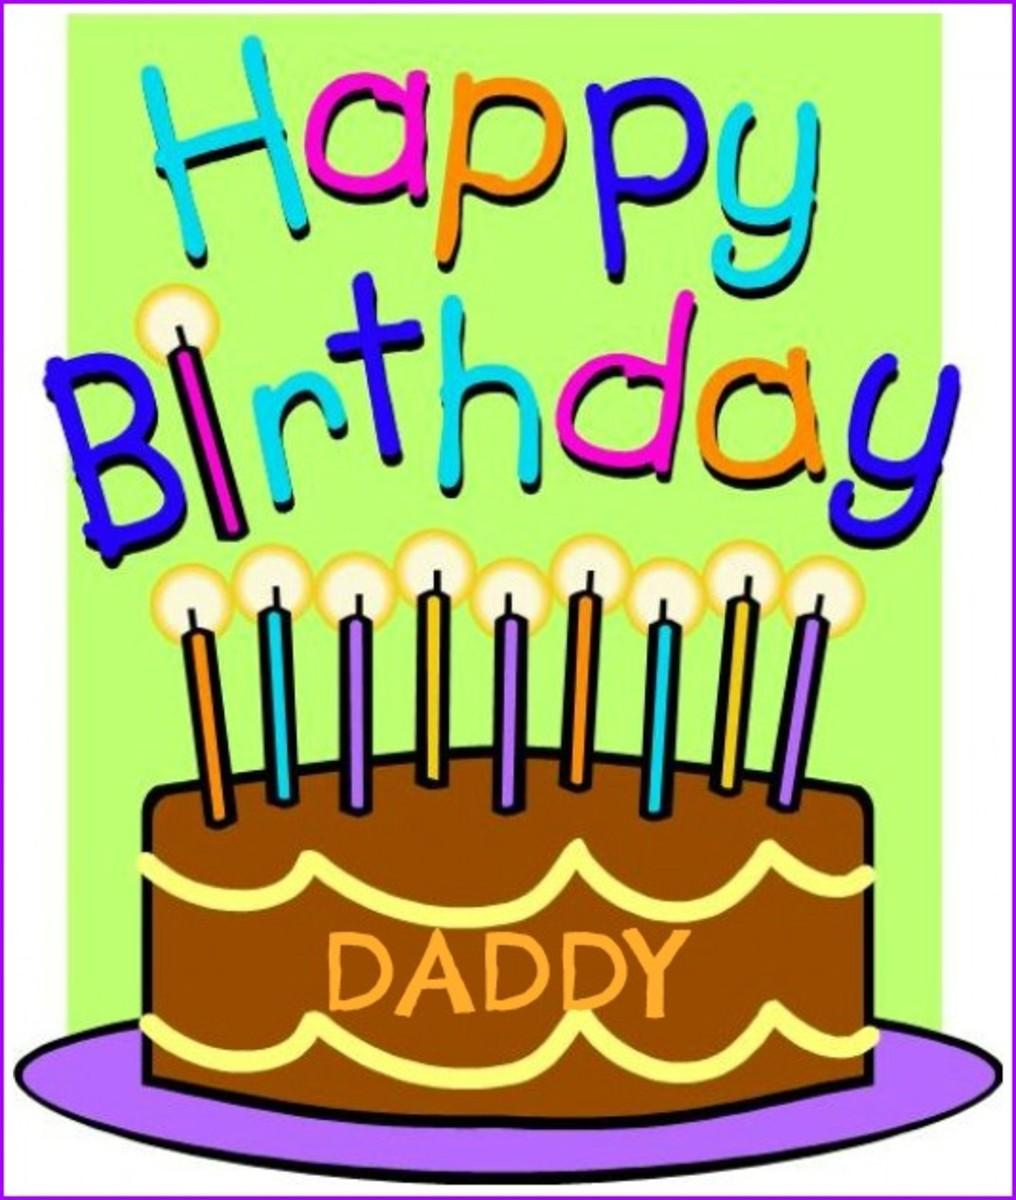 Dad Birthday Email